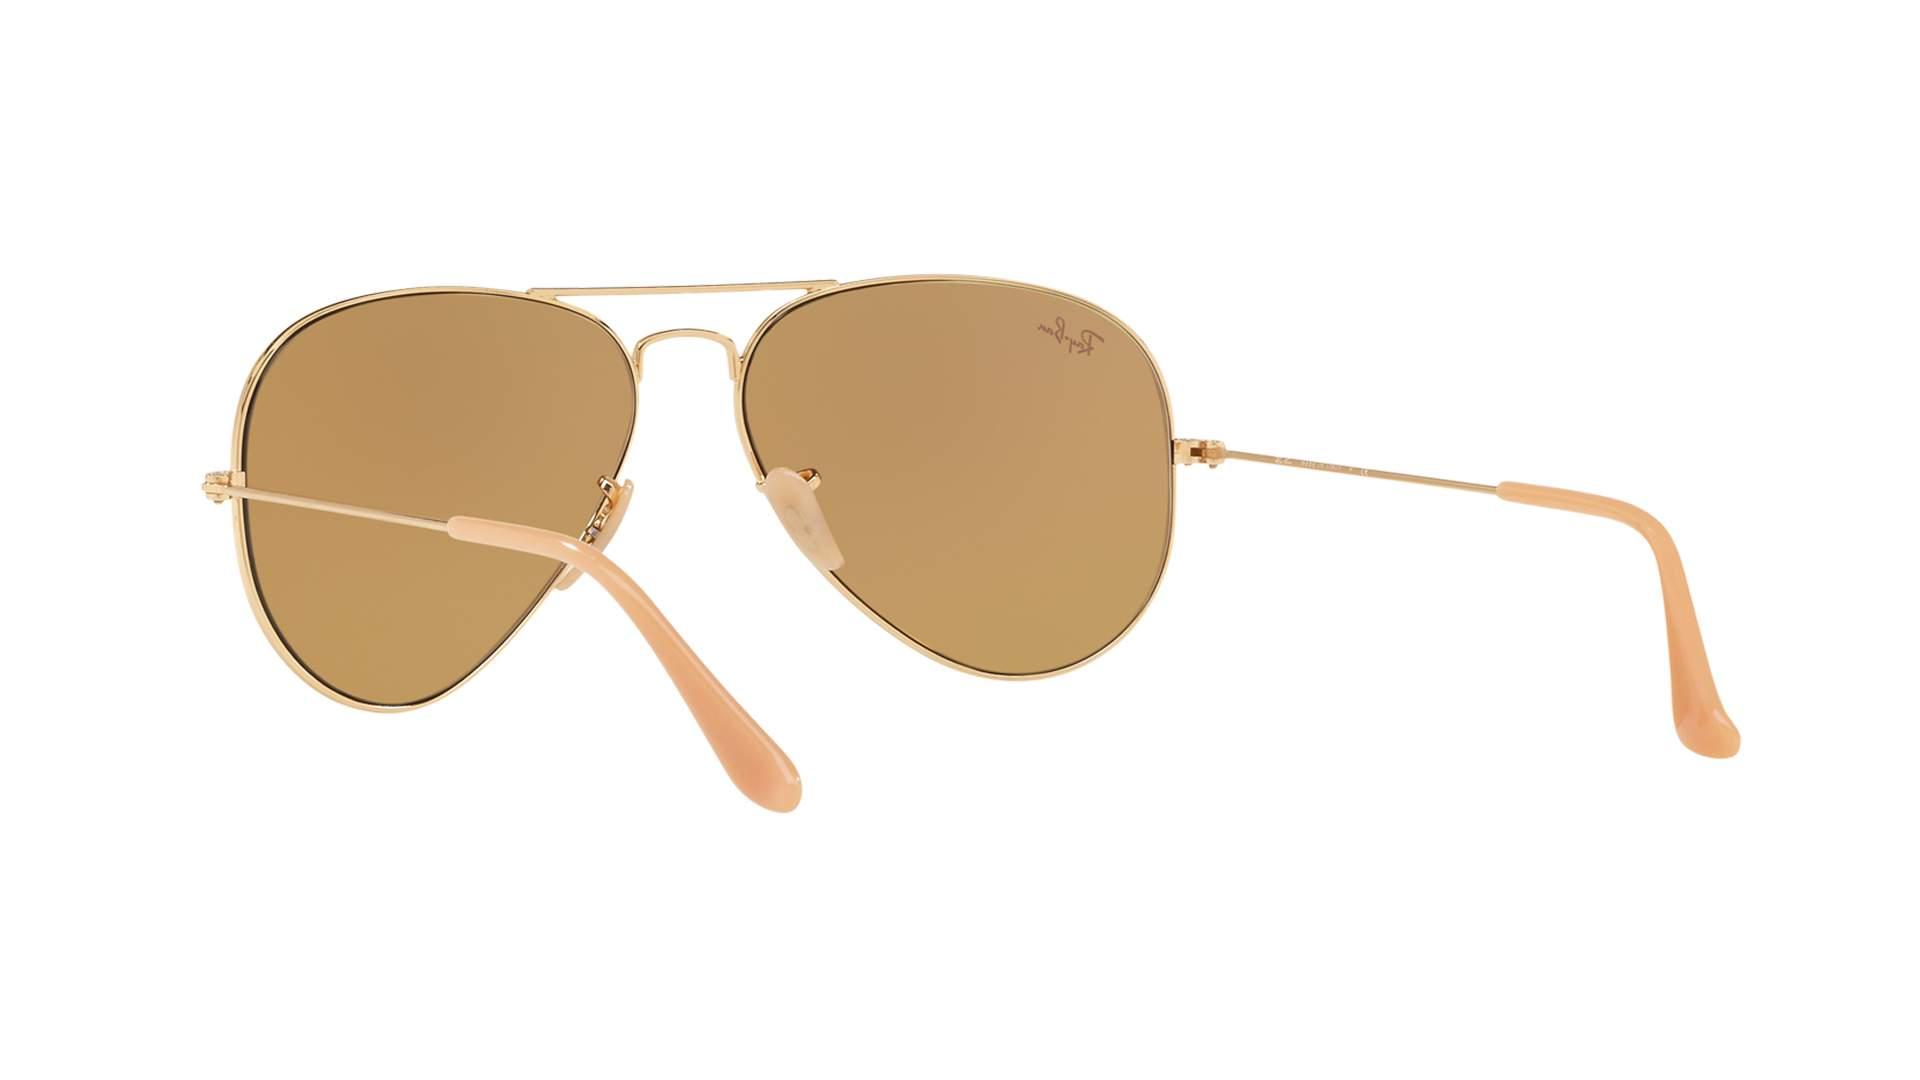 7ce4f83dfe944 Sunglasses Ray-Ban Aviator Evolve Gold RB3025 9064 4I 58-14 Large  Photochromic